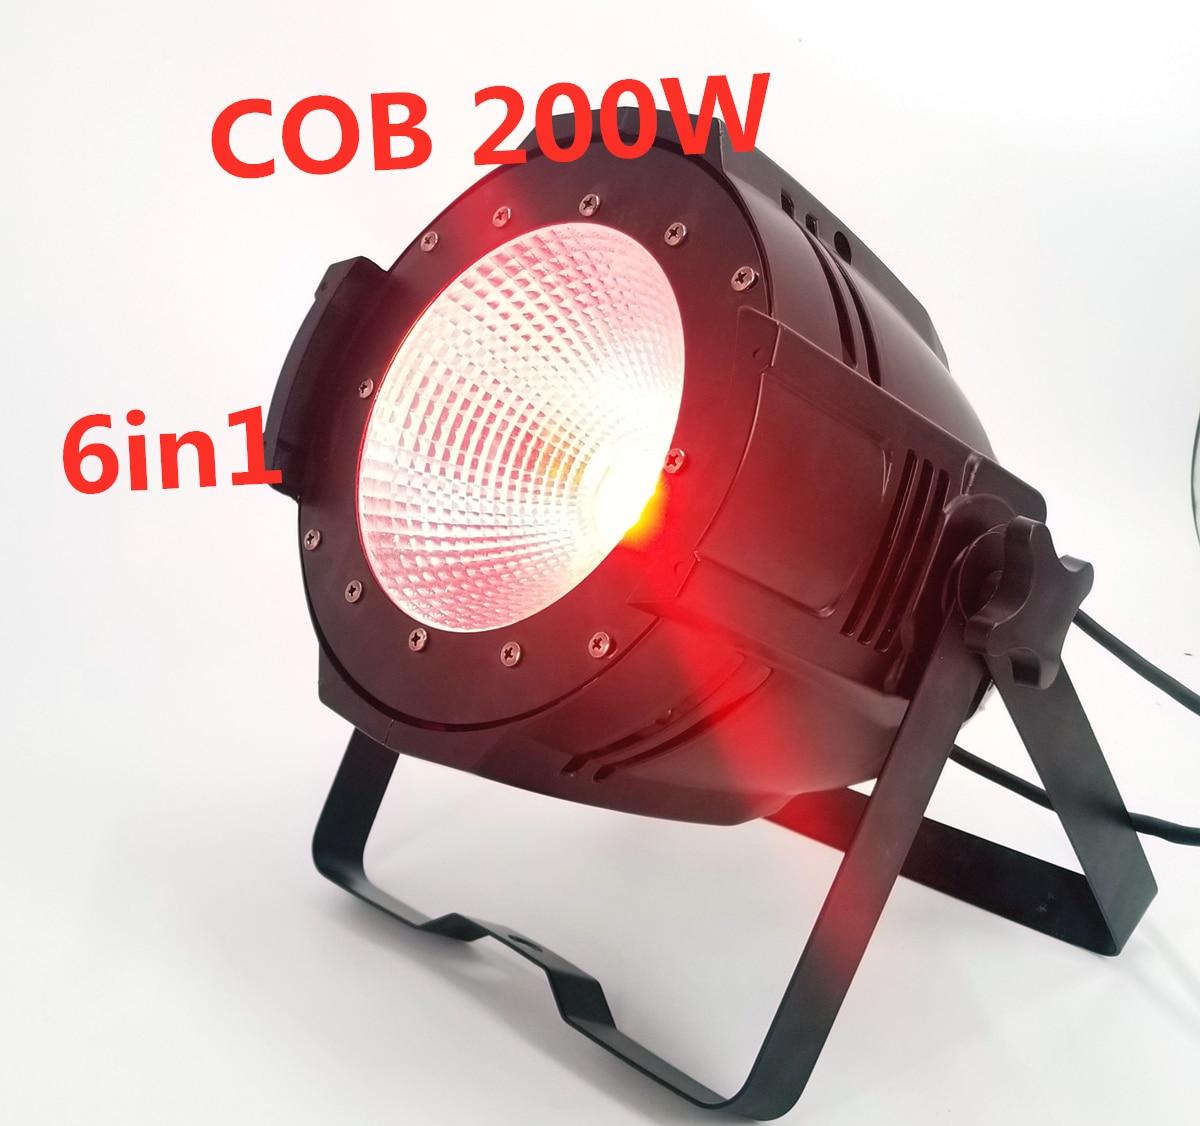 200W COB Led Par Light RGBWA UV 6in1  Dj Light LED DMX Disco Stage Lighting Effects